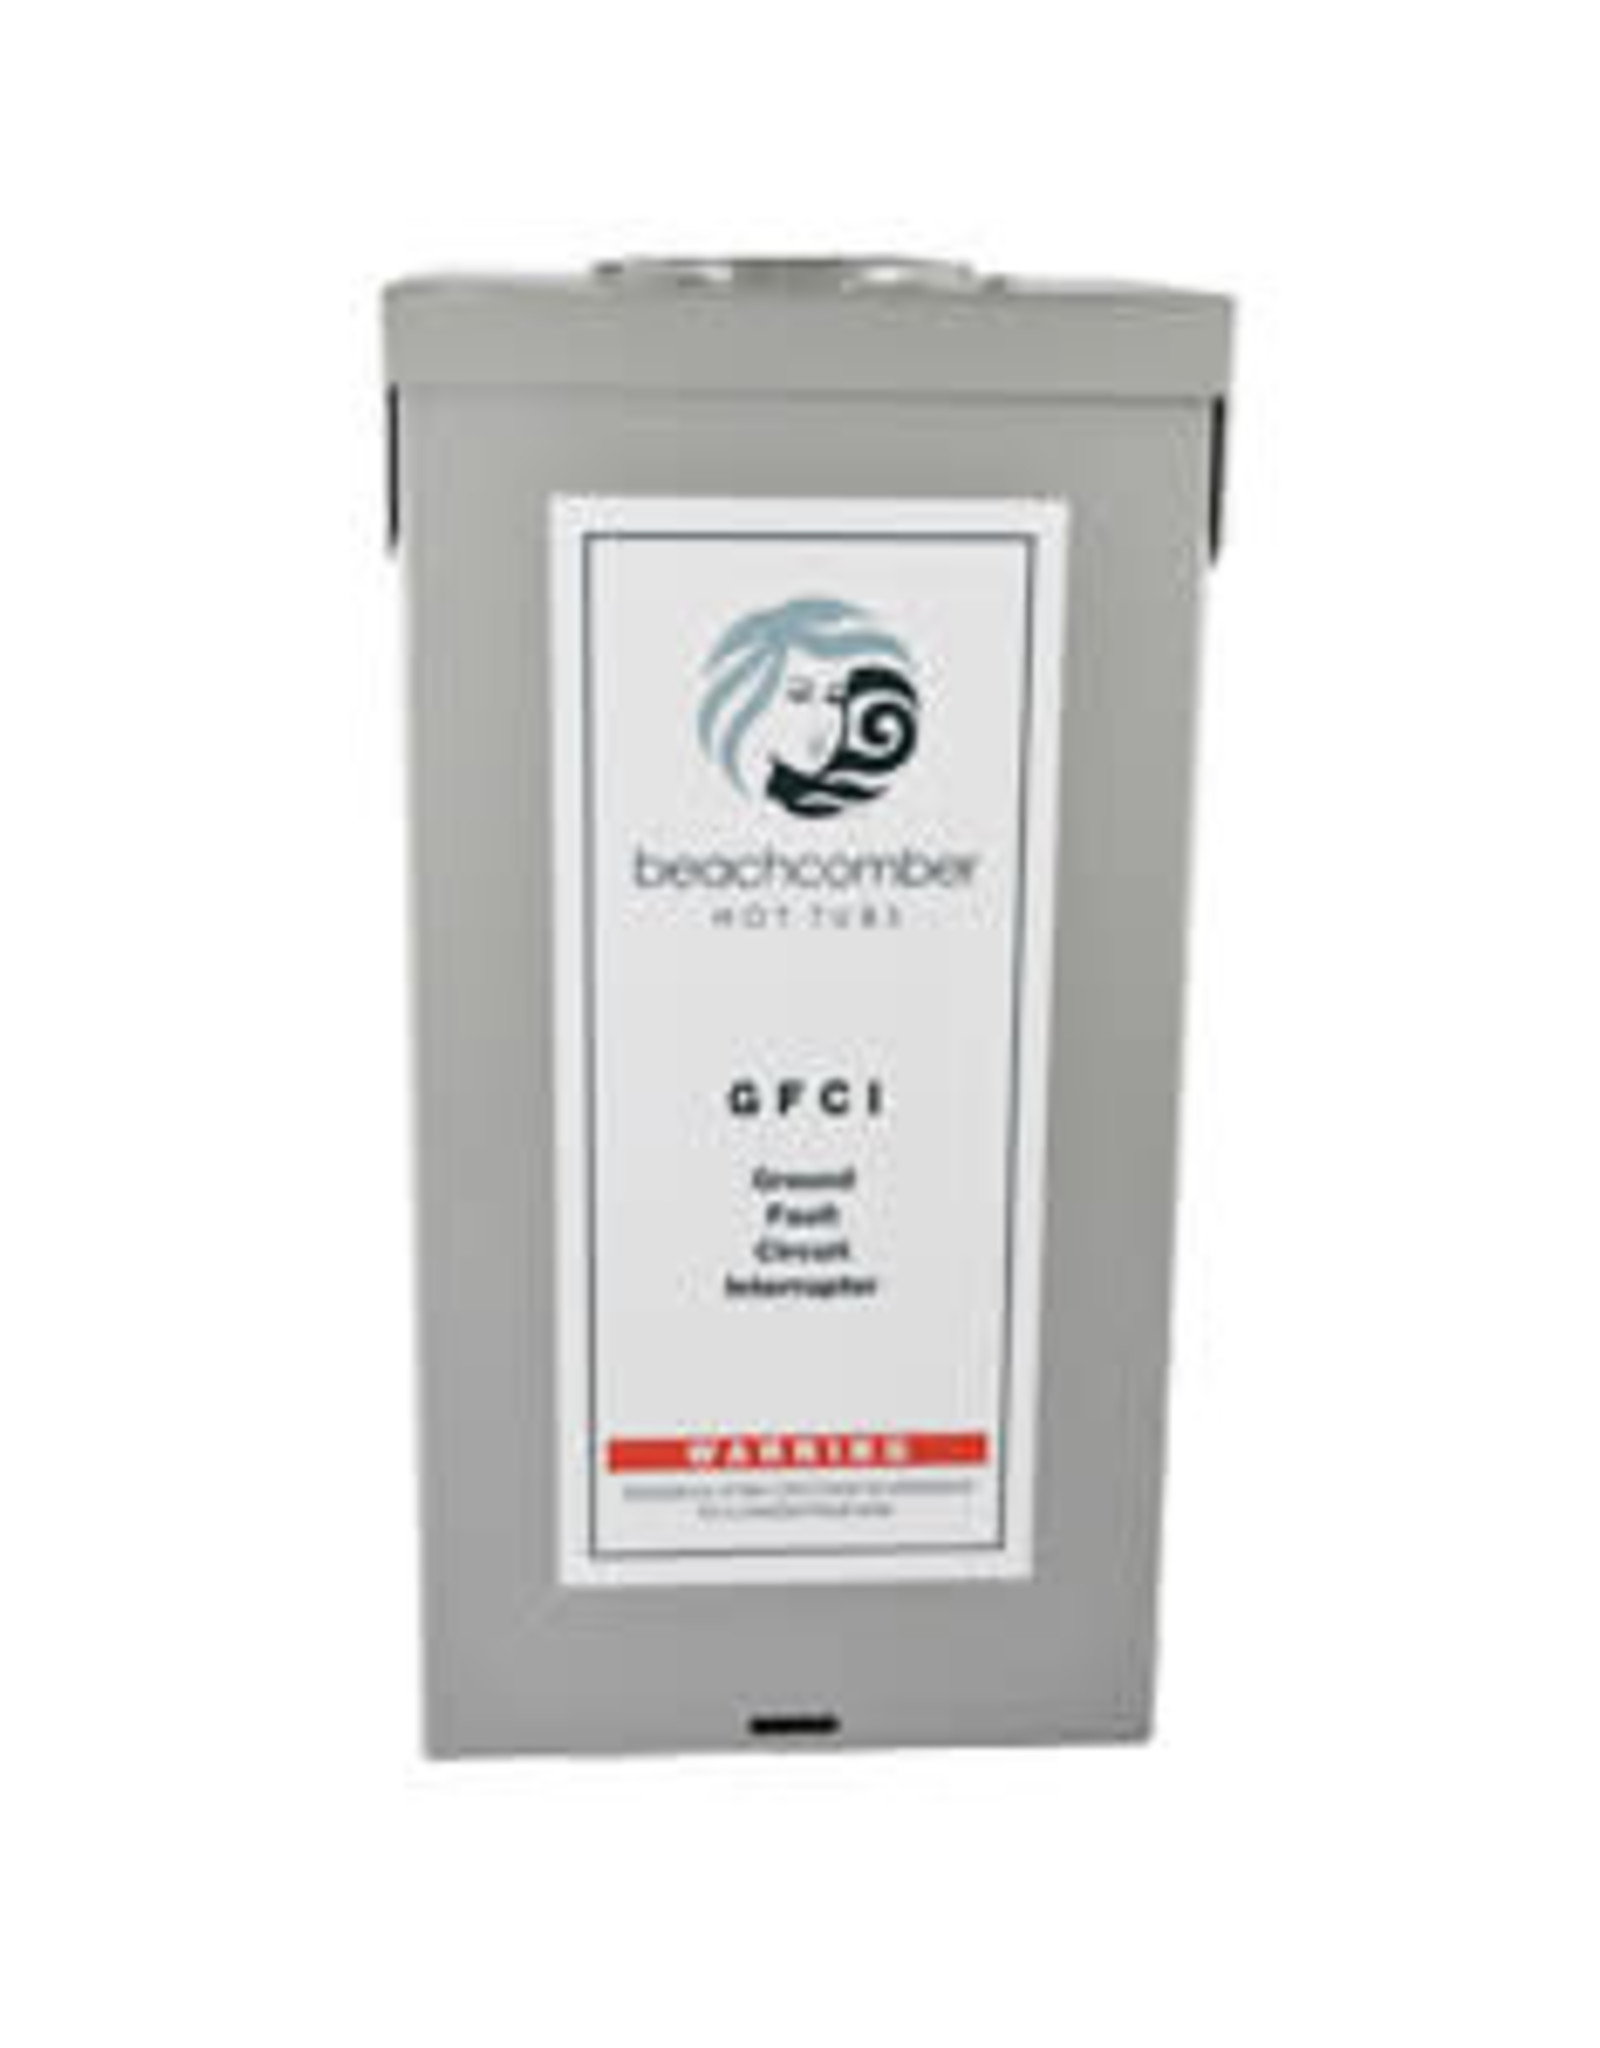 BEACHCOMBER BEACHCOMBER GFCI 50 AMP